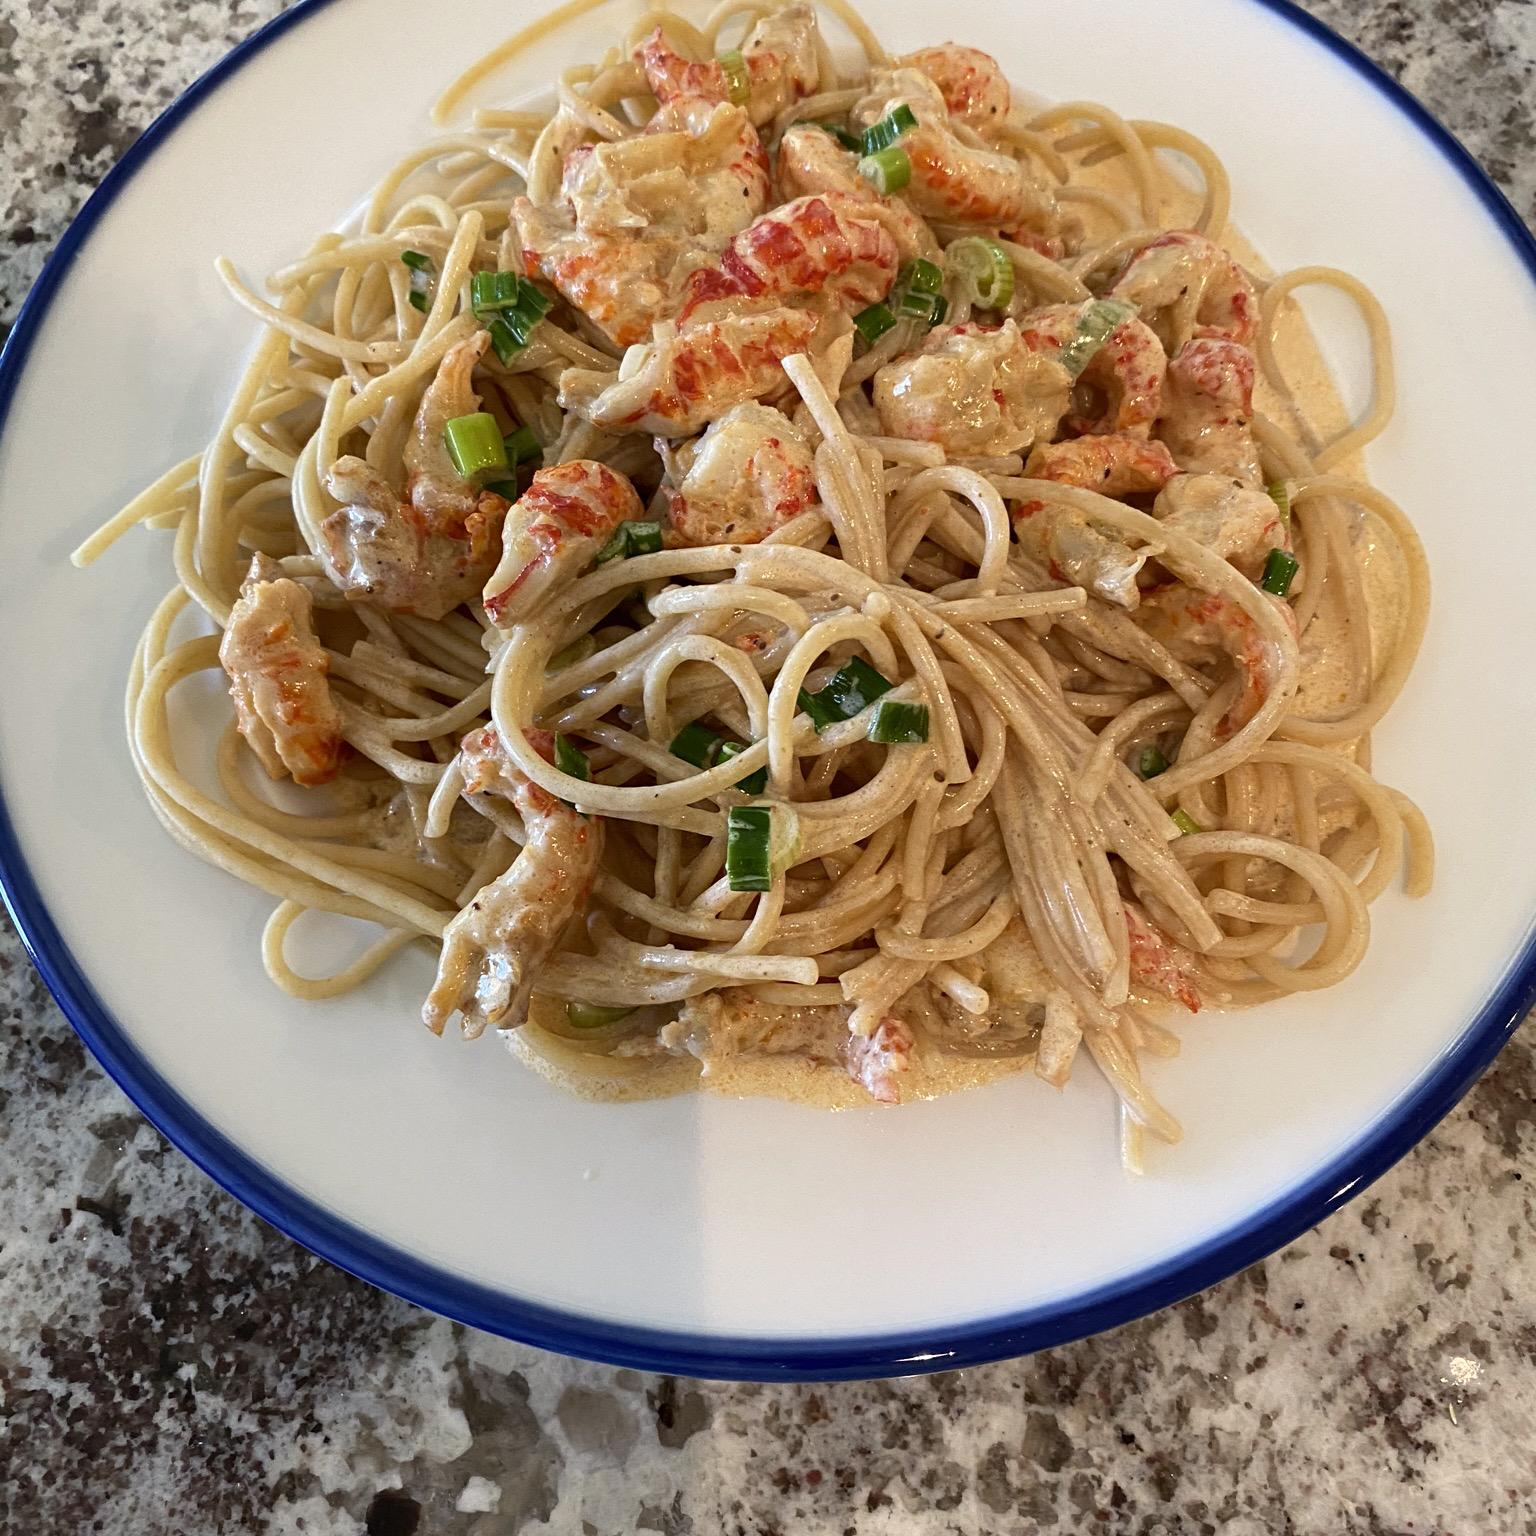 Crayfish or Shrimp Pasta vic1995740il